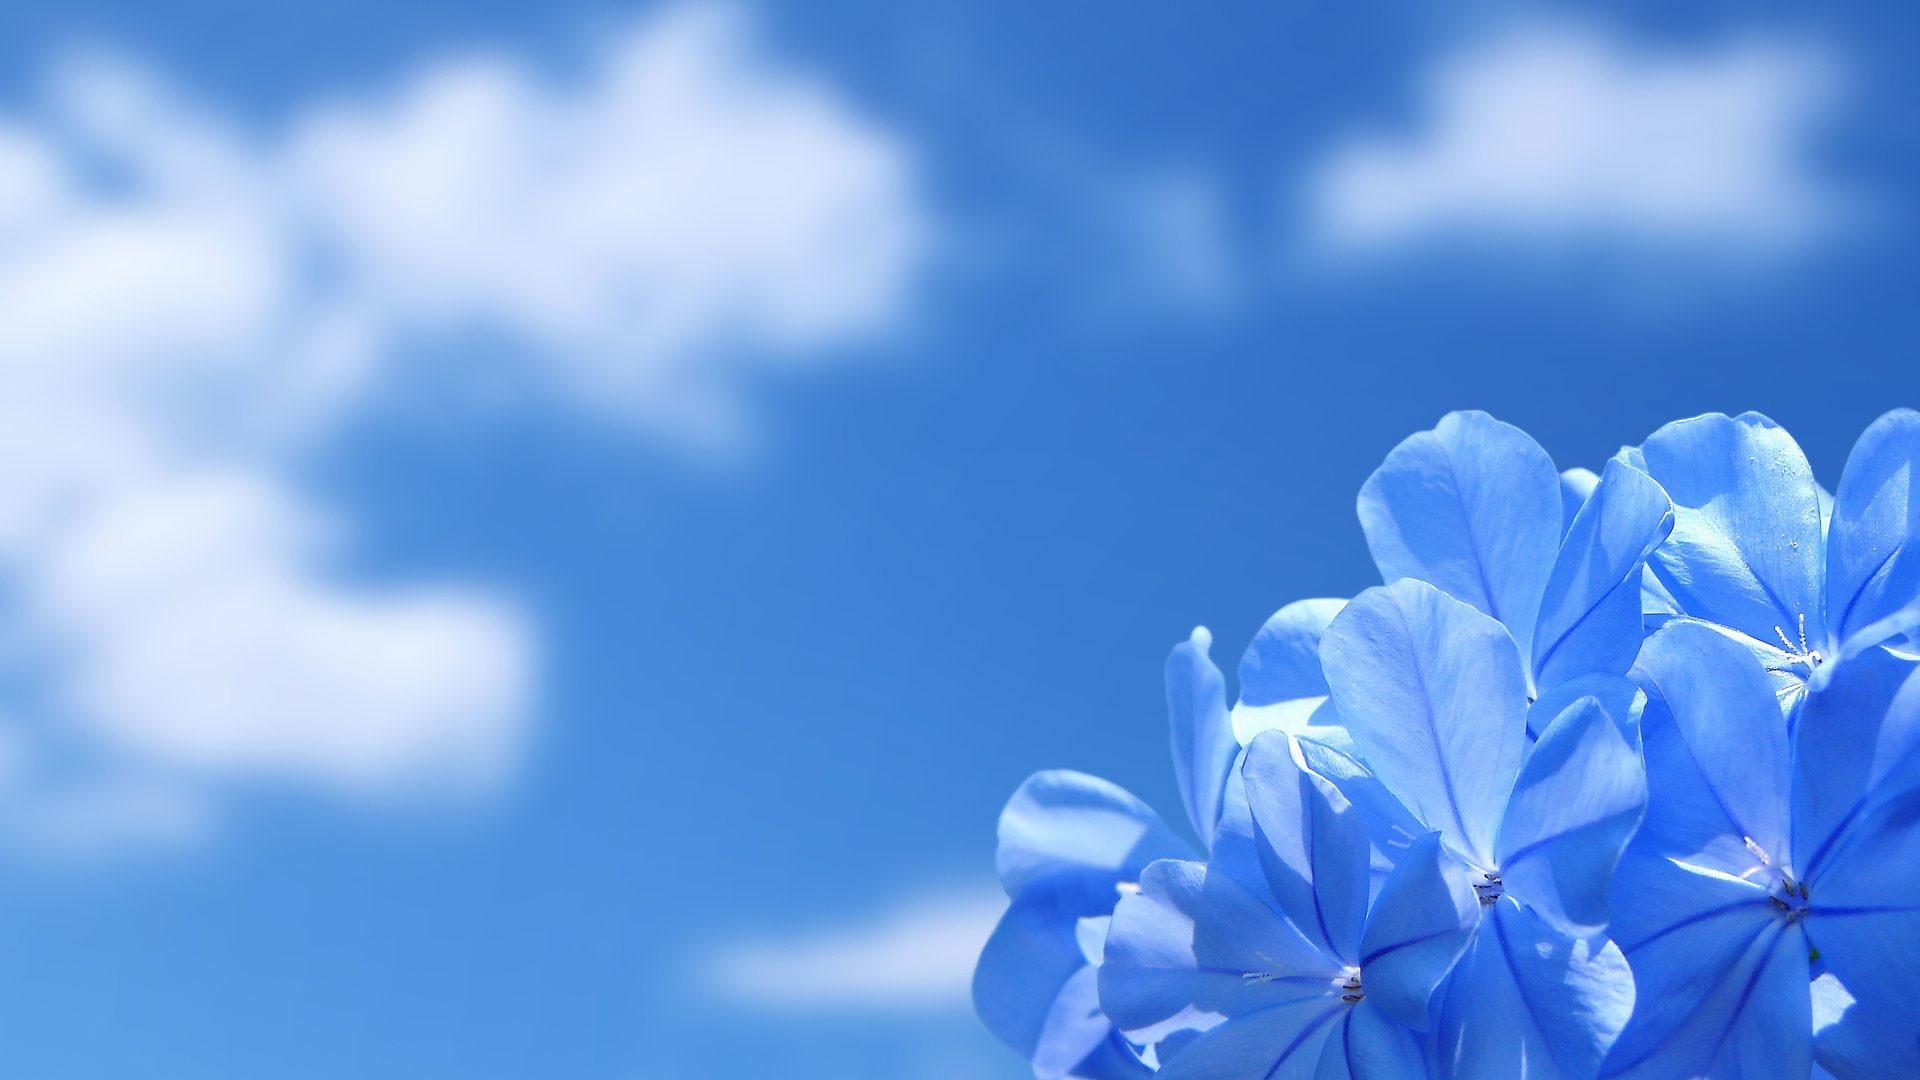 hd pics photos flowers blue sky desktop background wallpaper